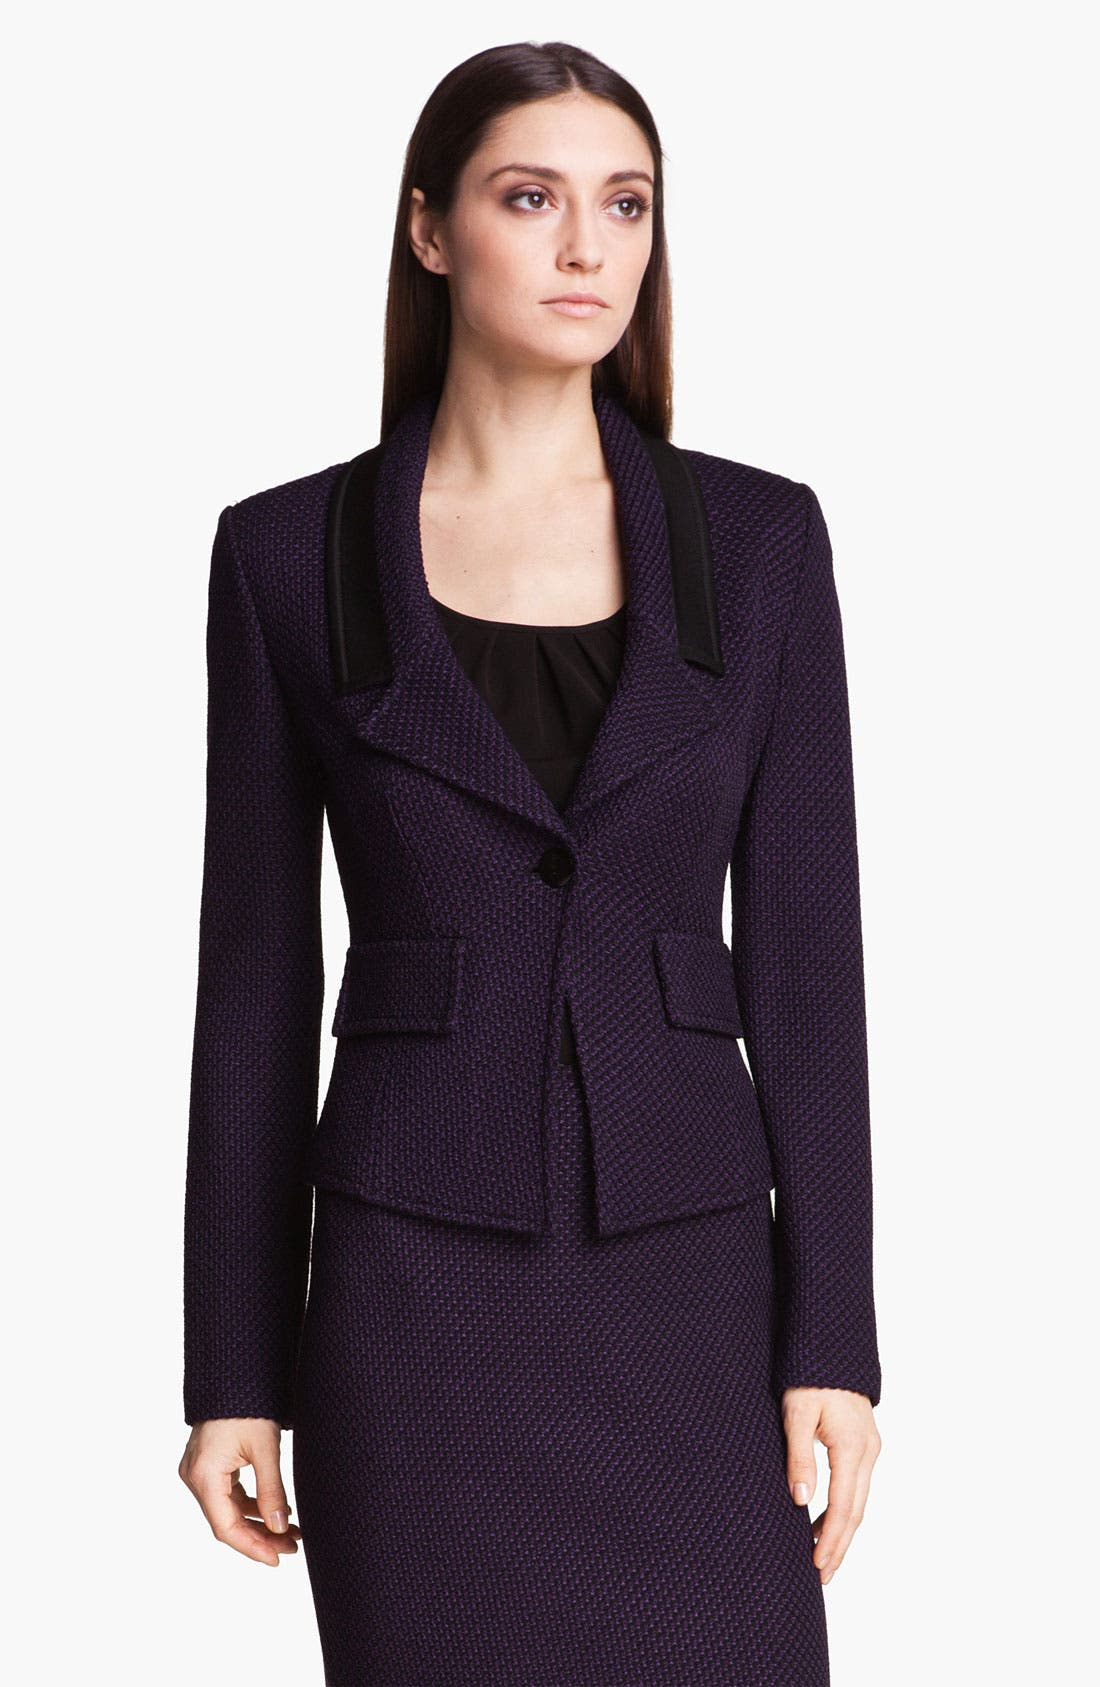 Alternate Image 1 Selected - St. John Collection 'Waldorf' Tweed Jacket